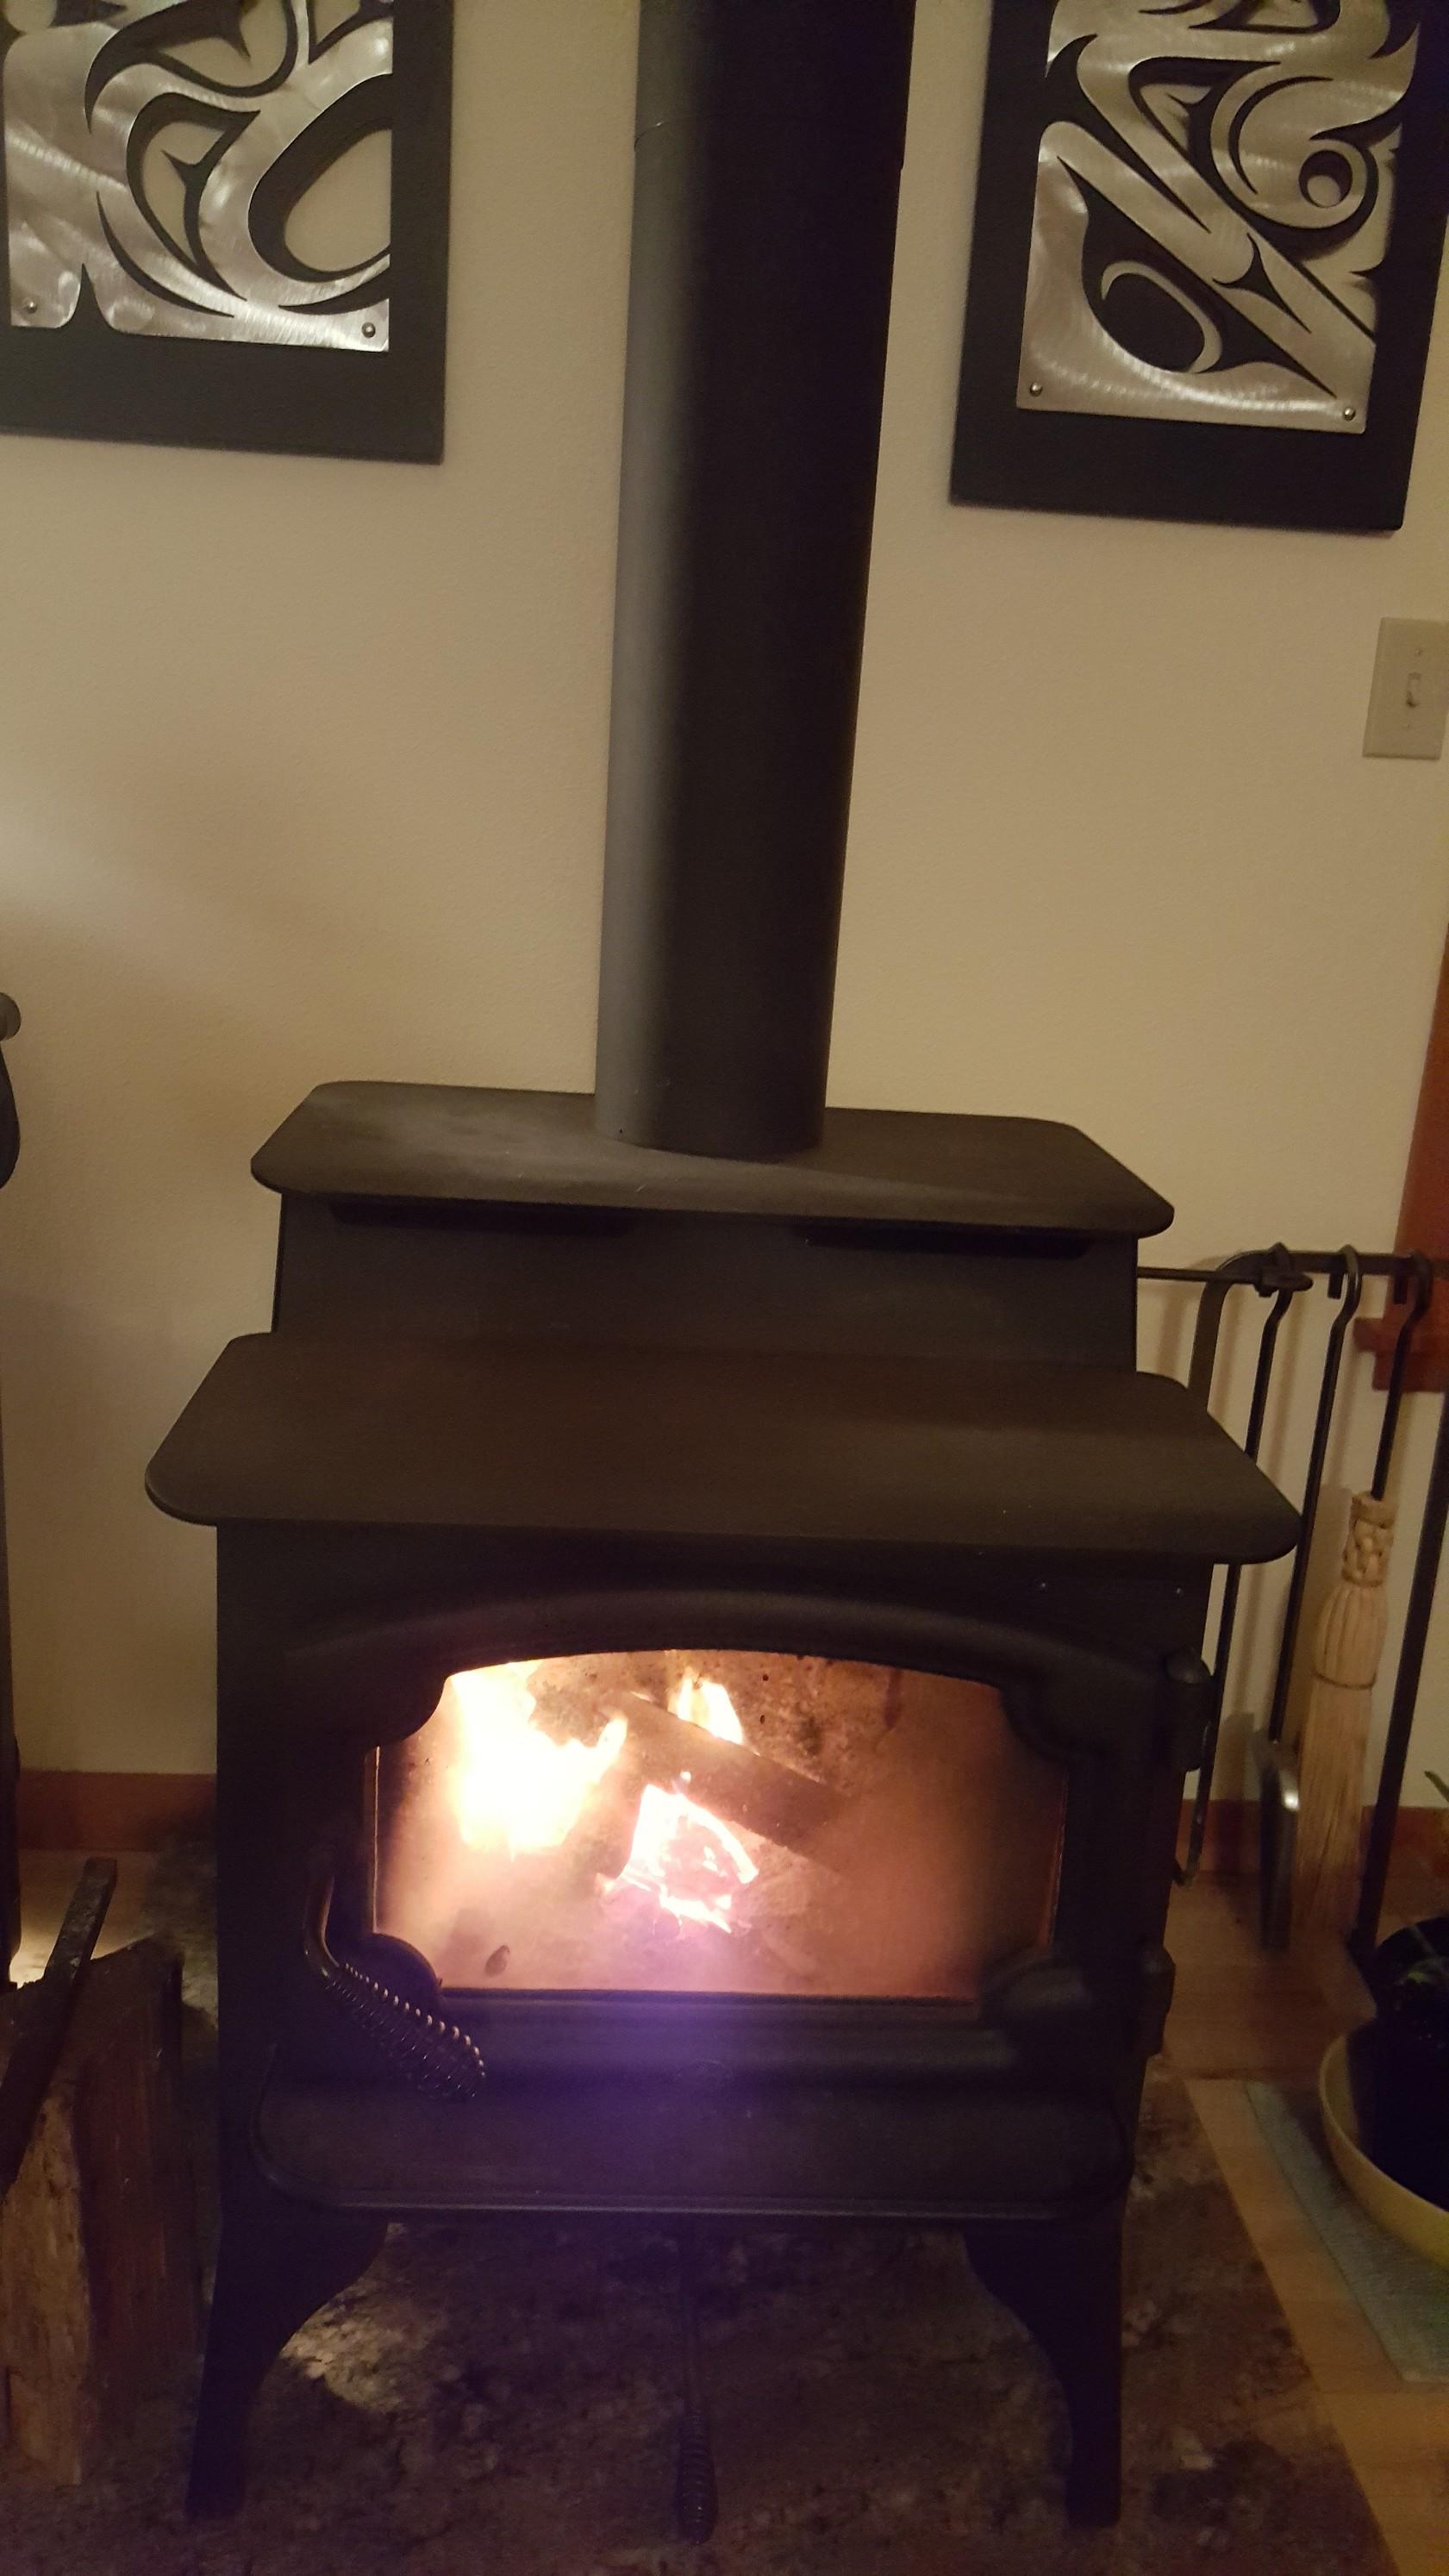 Heat stove to keep warm